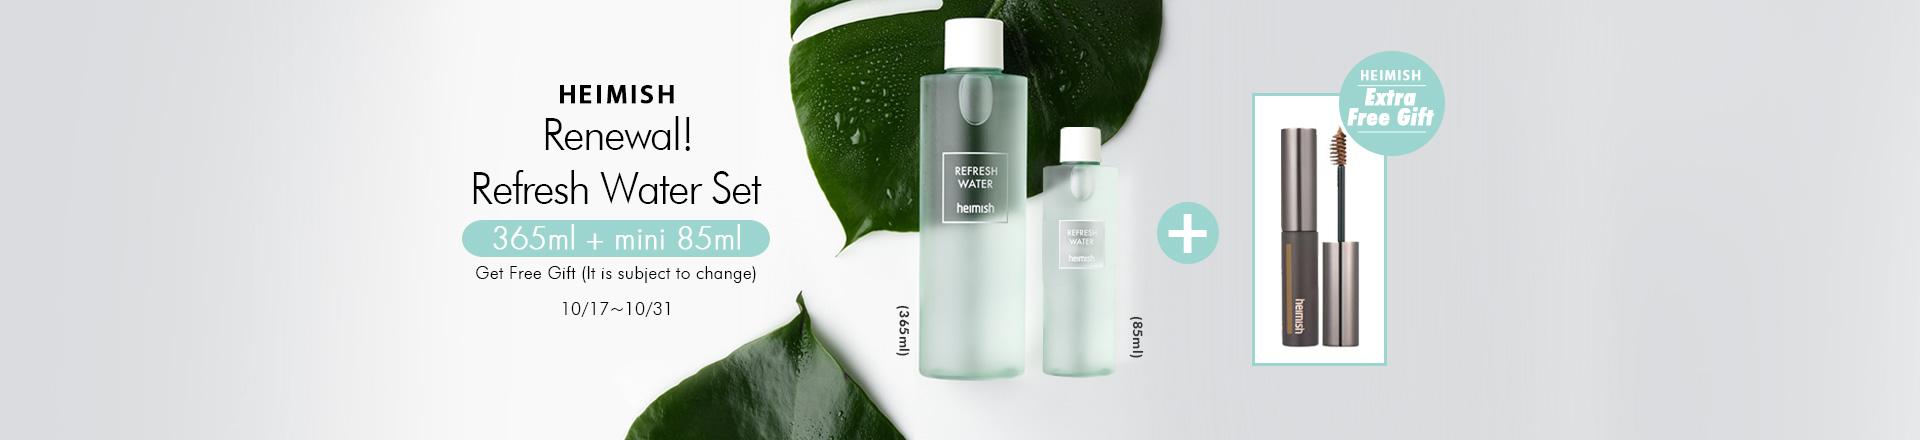 Refresh Water